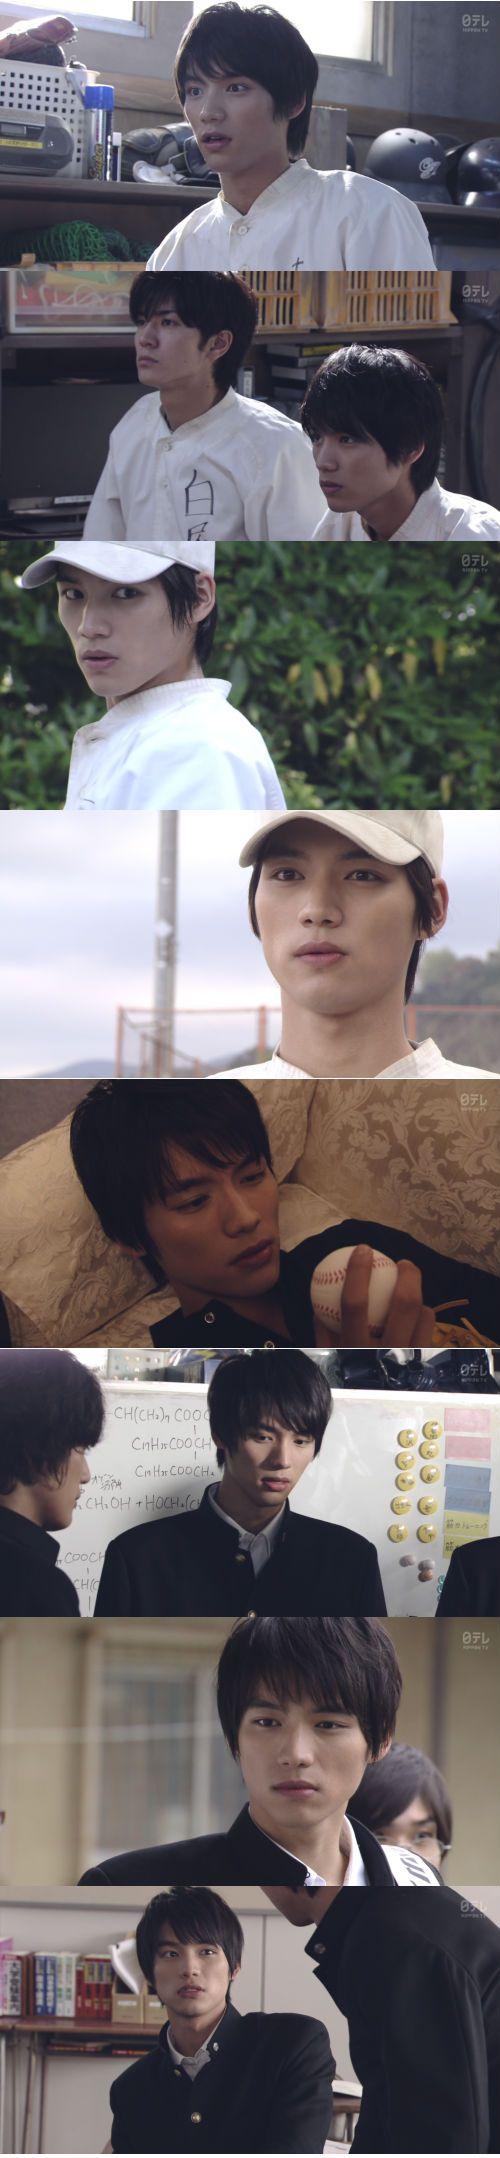 "Sota Fukushi, J drama ""yowakutemo katemasu"", 2014. Ep.1-11 [English Sub]muST WATCH"